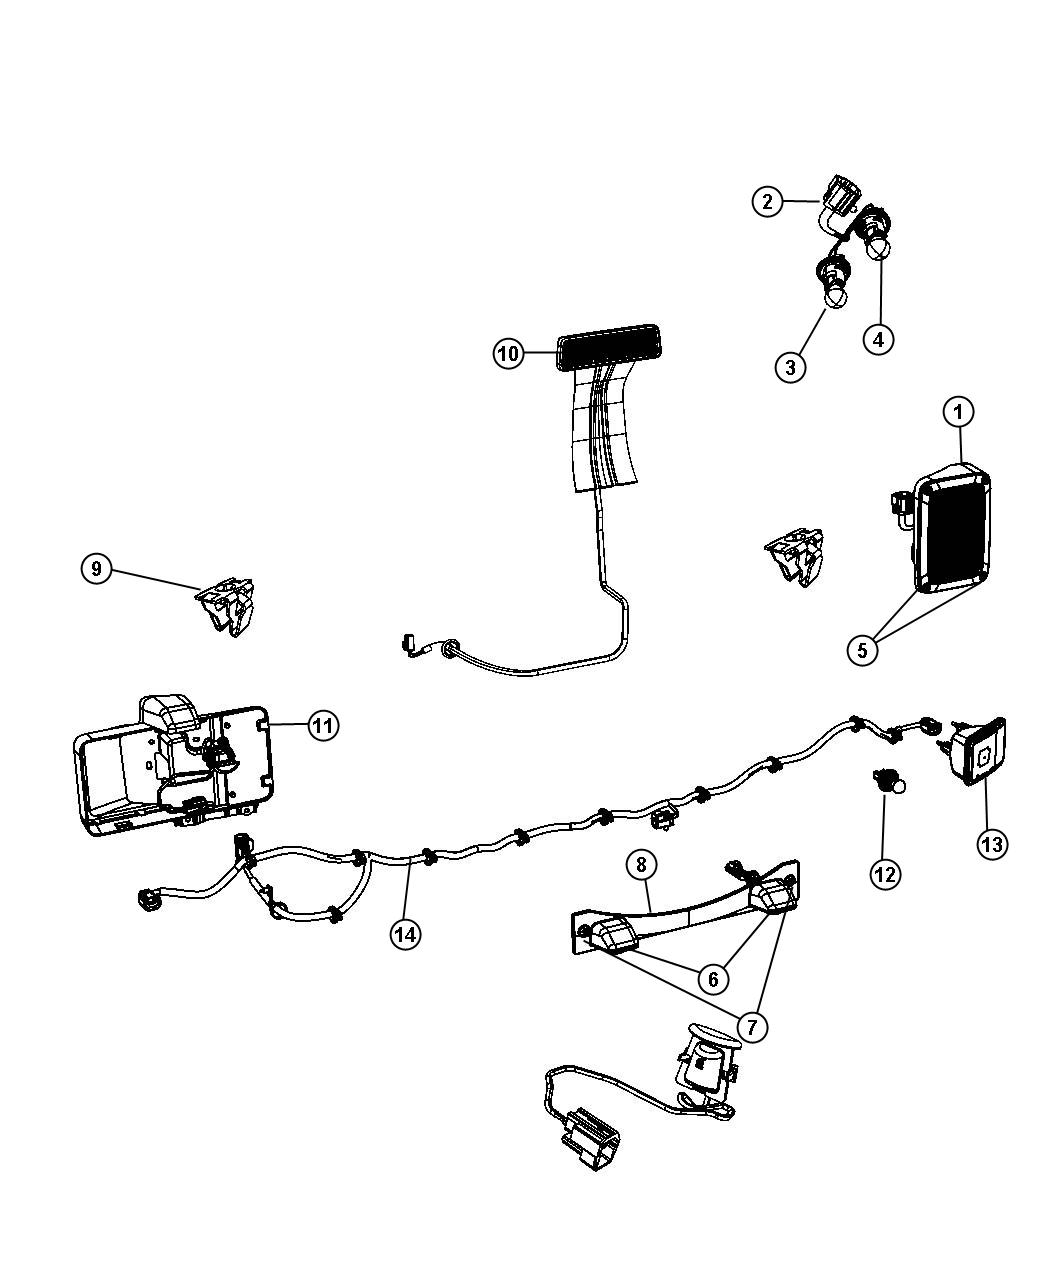 tags: #jeep wrangler interior trim kit#jeep wrangler dash warning  lights#2003 jeep wrangler dash#1995 jeep yj dash kit#jeep jk wrangler  digital dash#dash